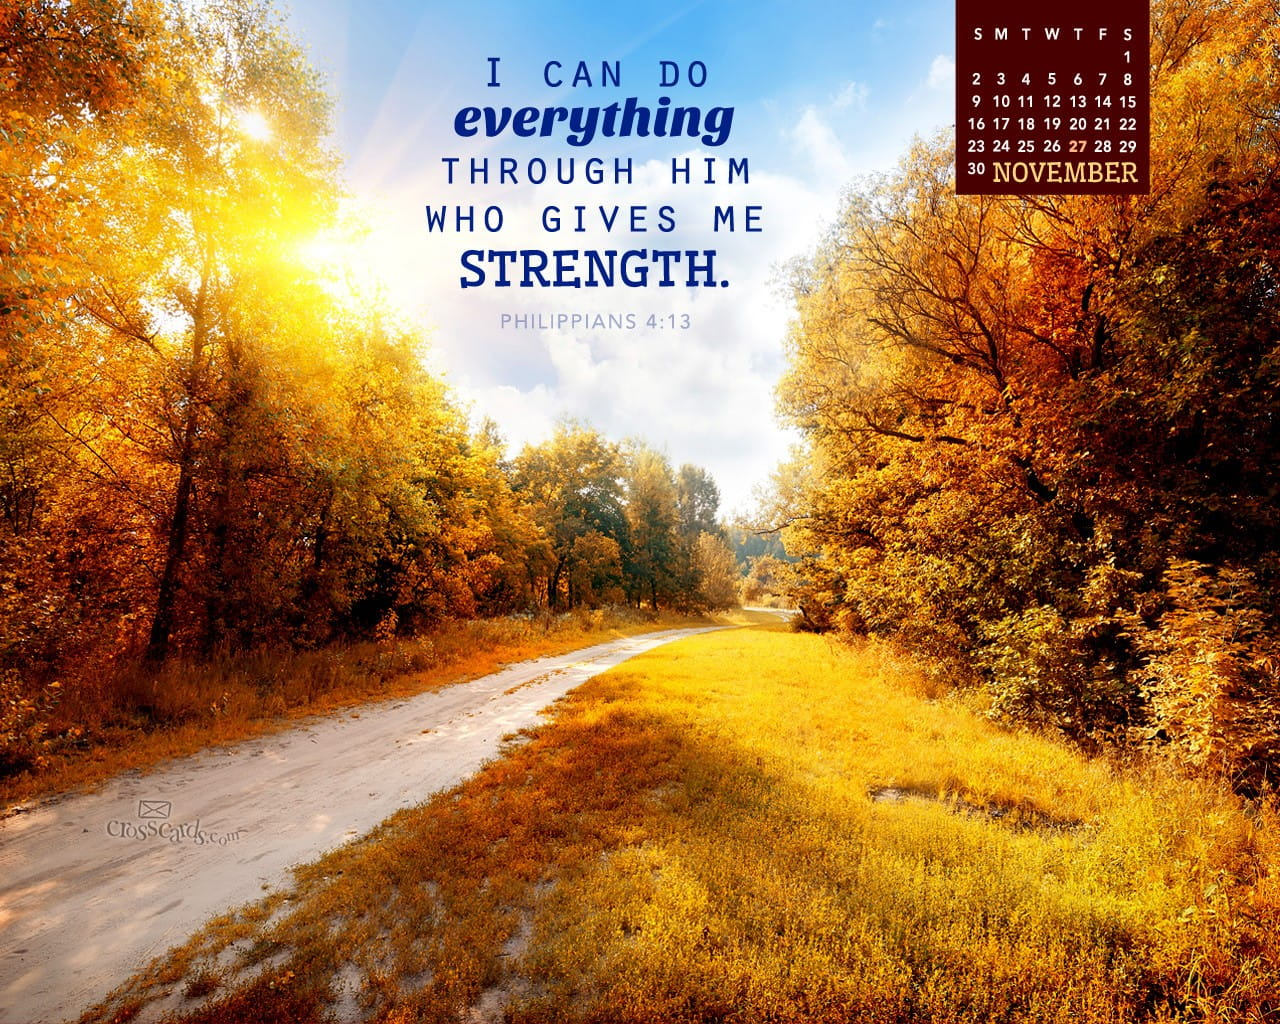 Fall Live Wallpaper Phone November 2014 All Things Desktop Calendar Free November